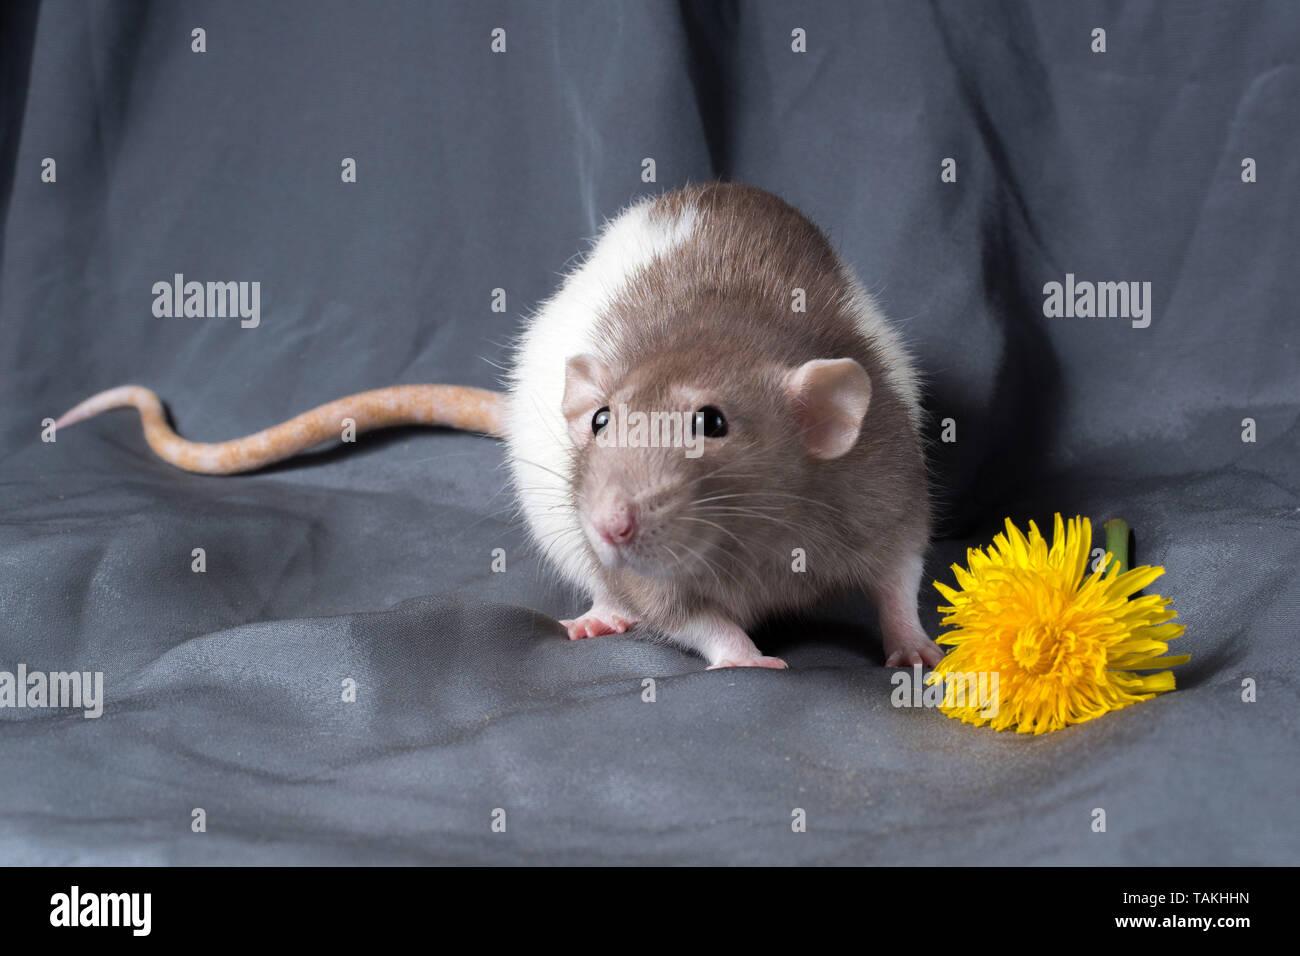 rat on a dark background - Stock Image